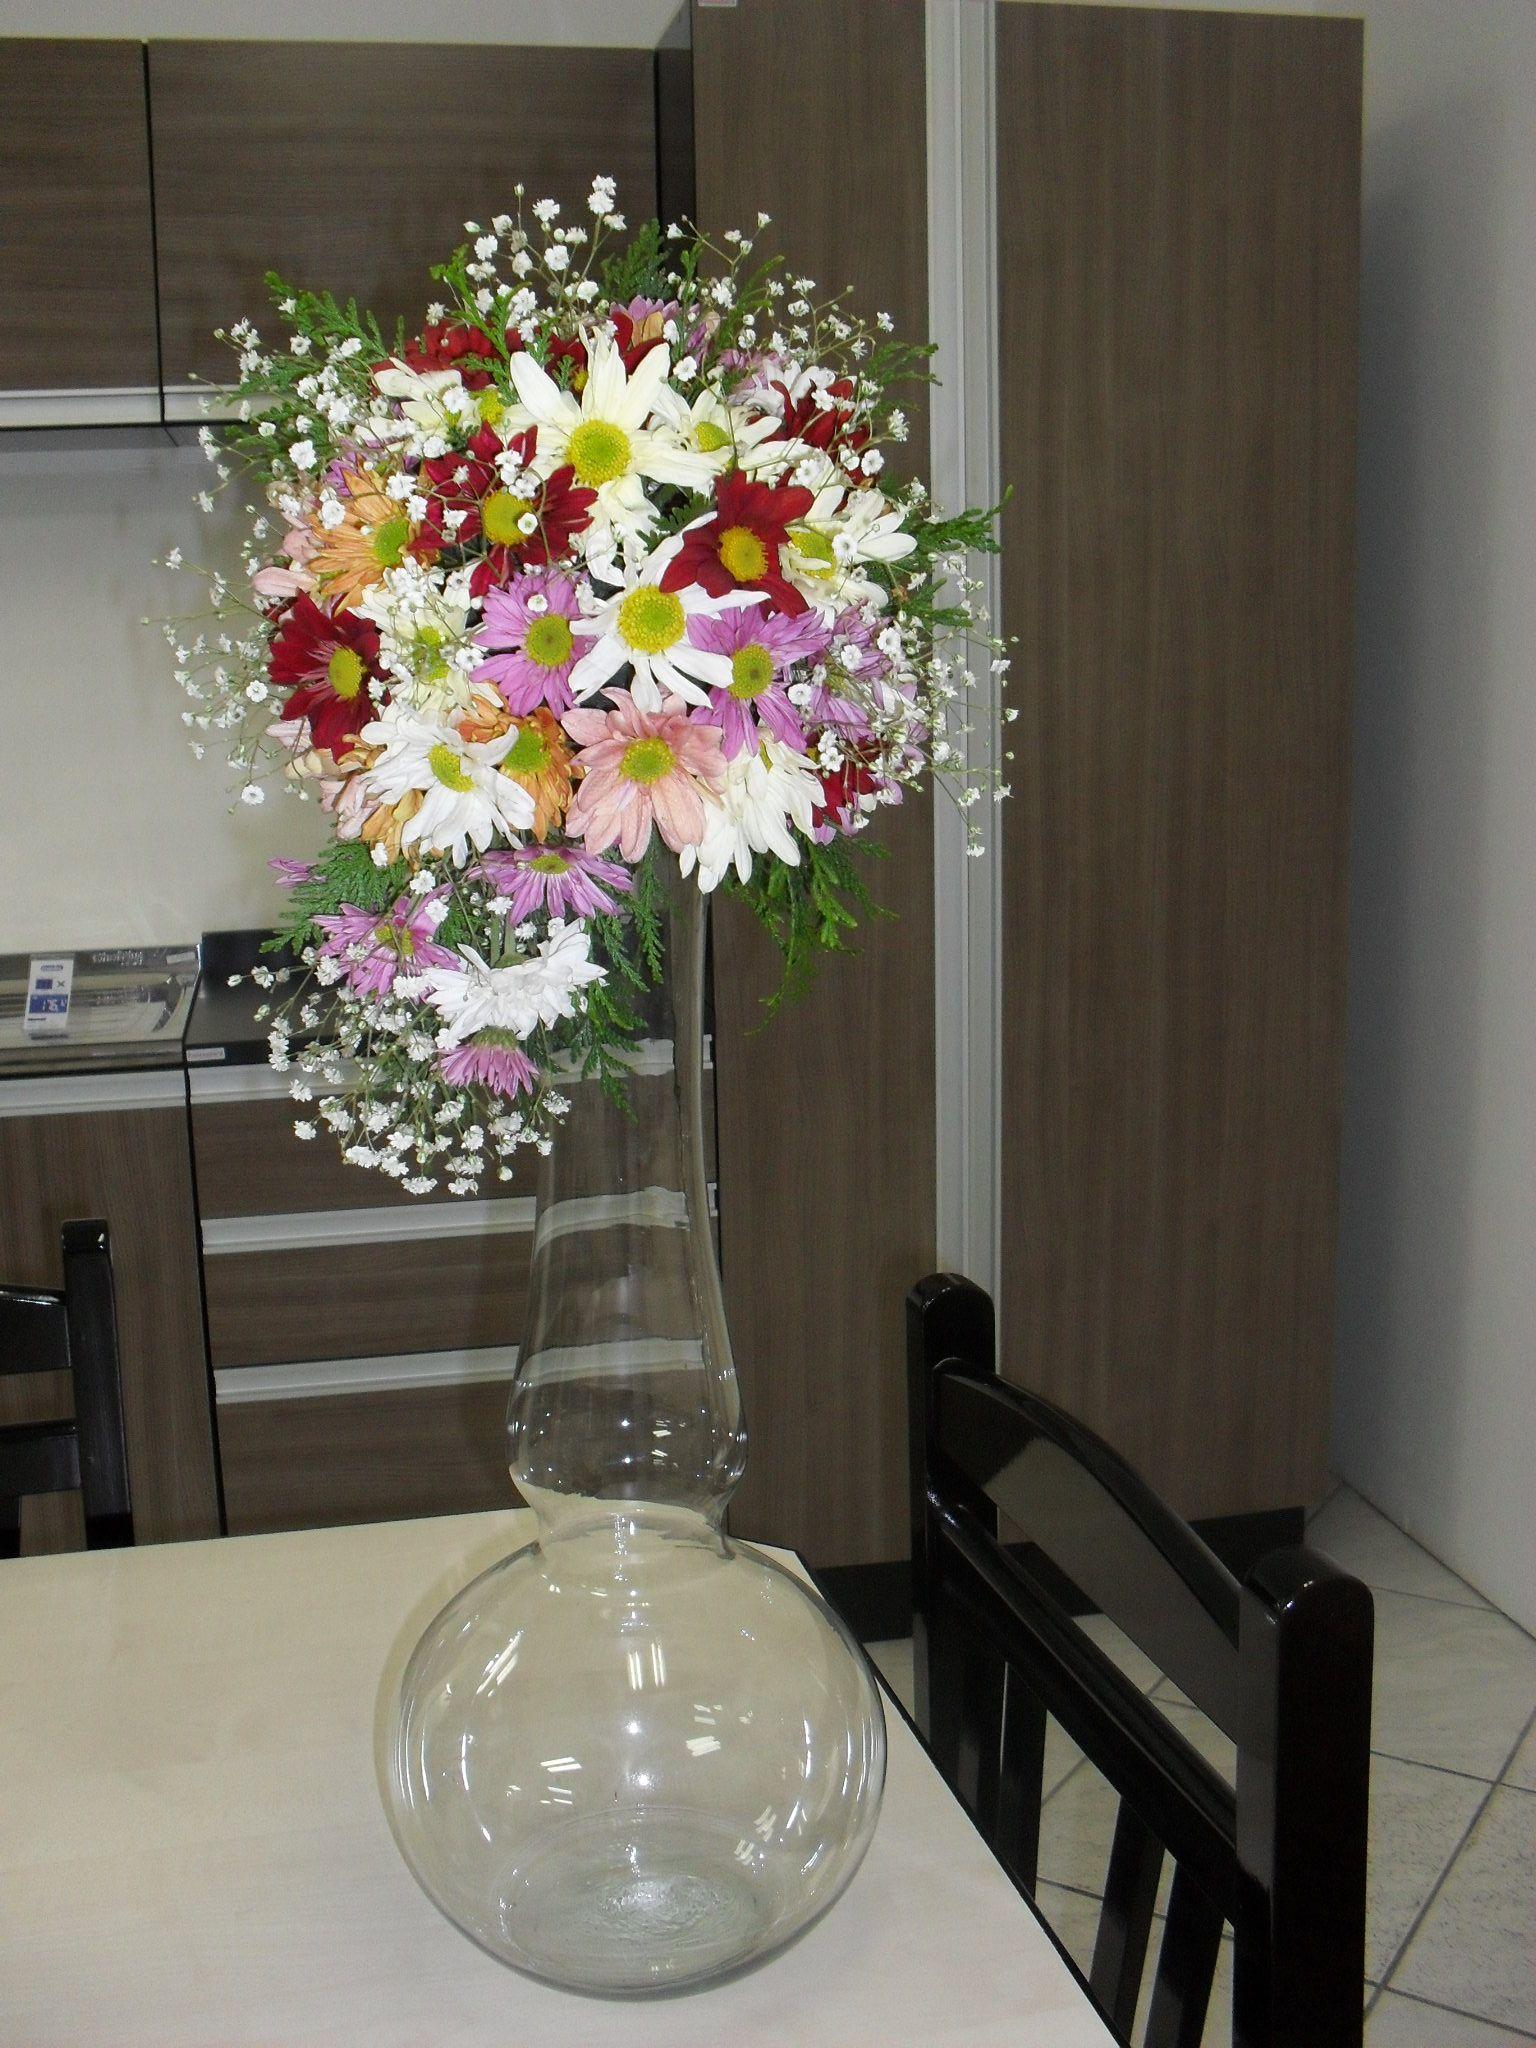 Centro De Mesa Com Crisantemo Margaridas Arranjos De Flores